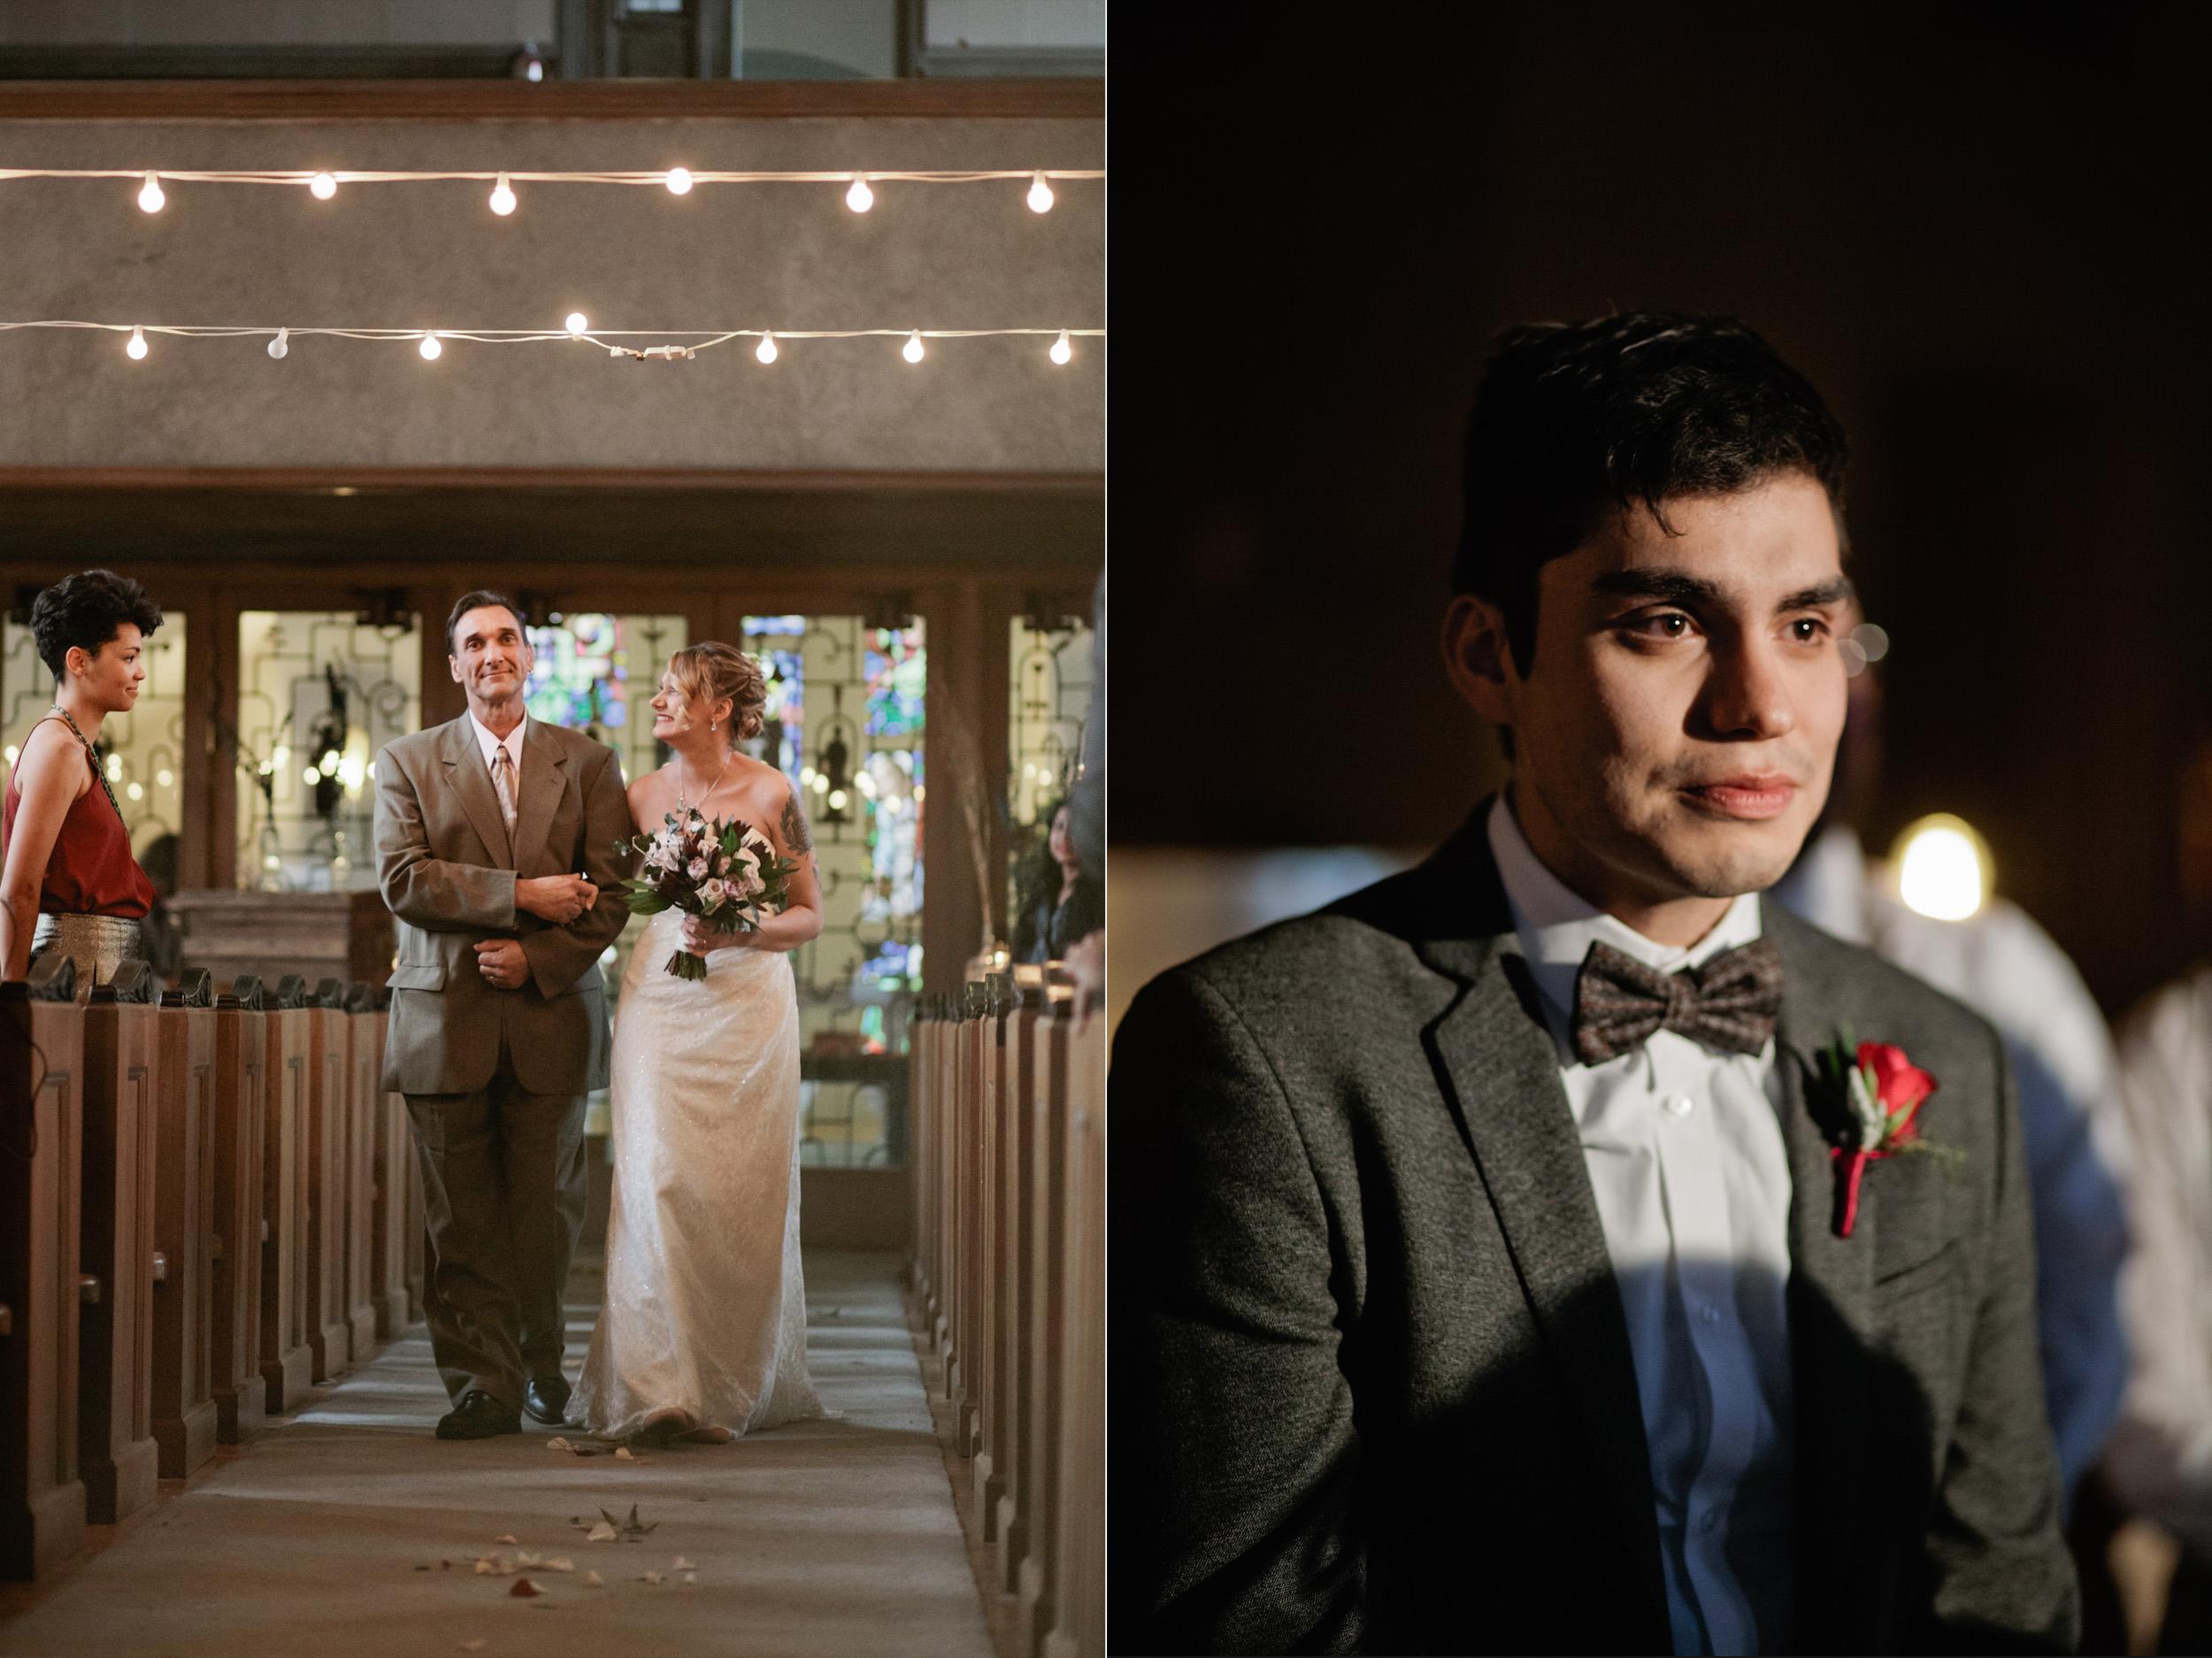 providence-wedding-photographer-1b.jpg